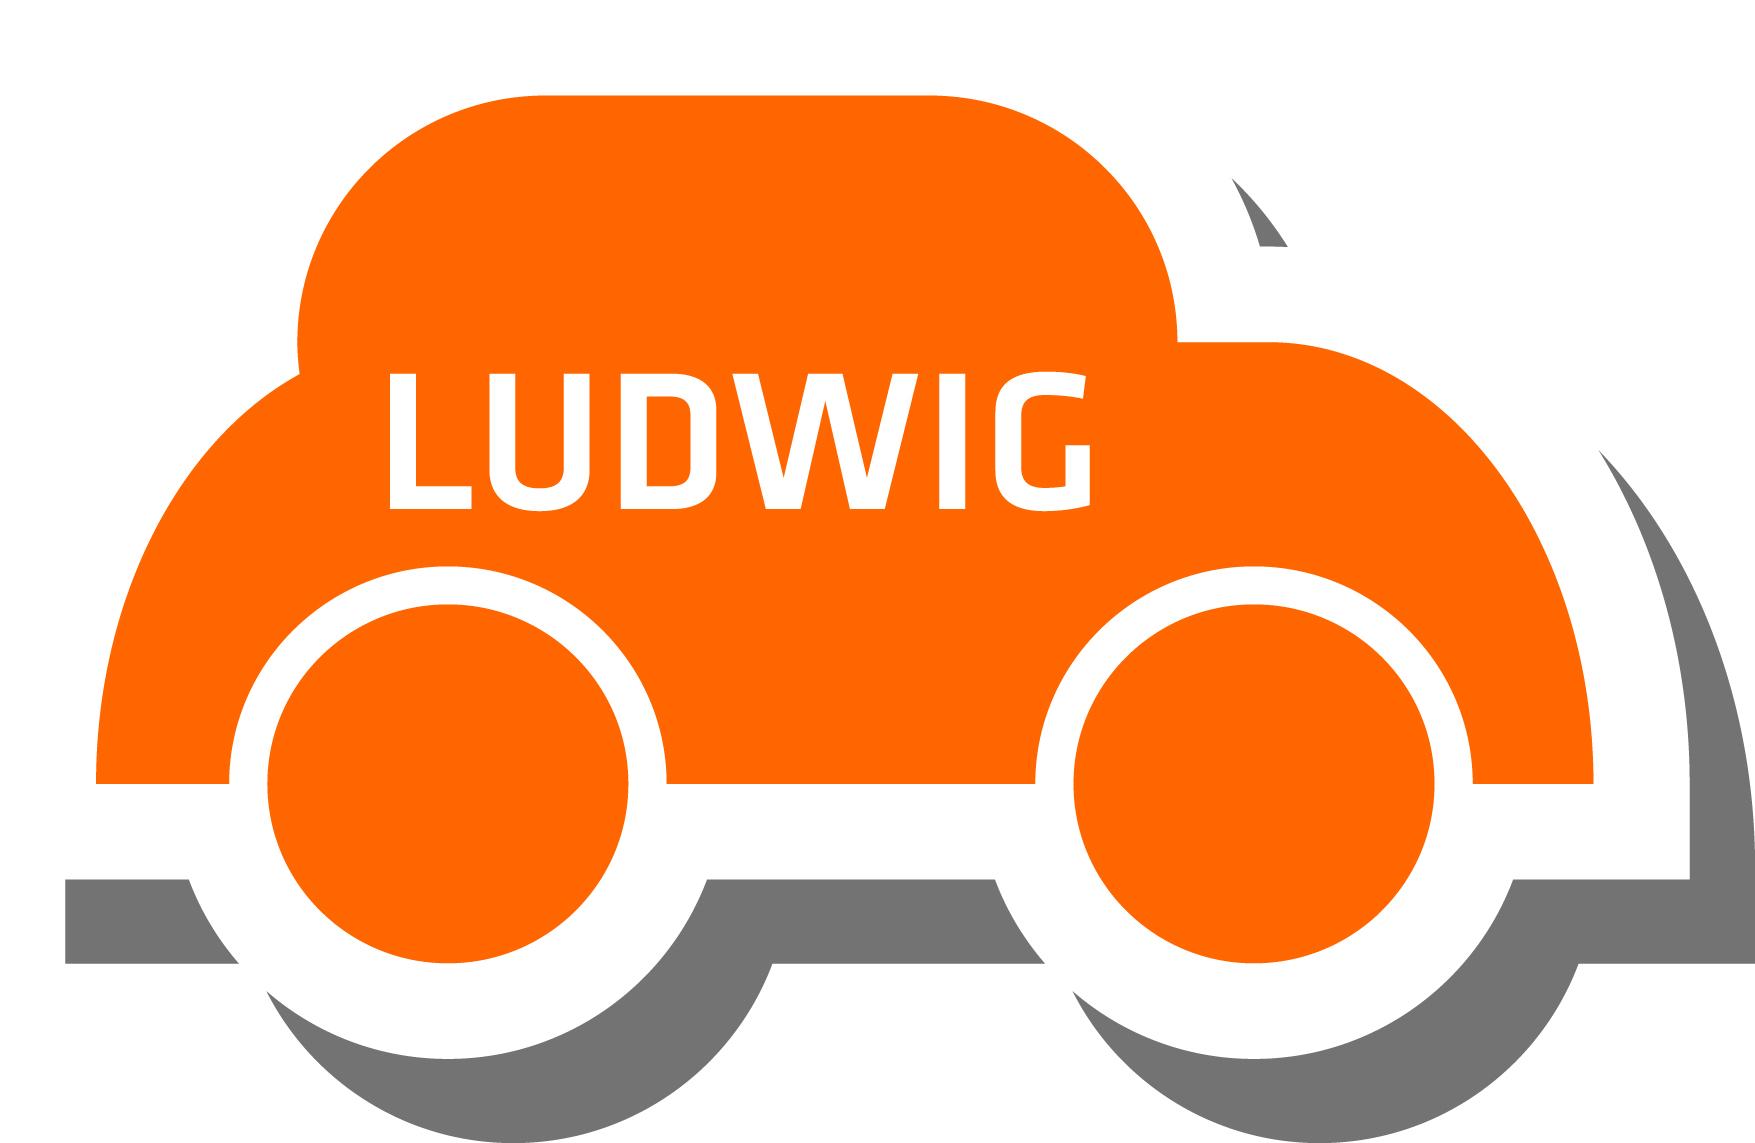 Kfz-Meisterwerkstatt Ludwig